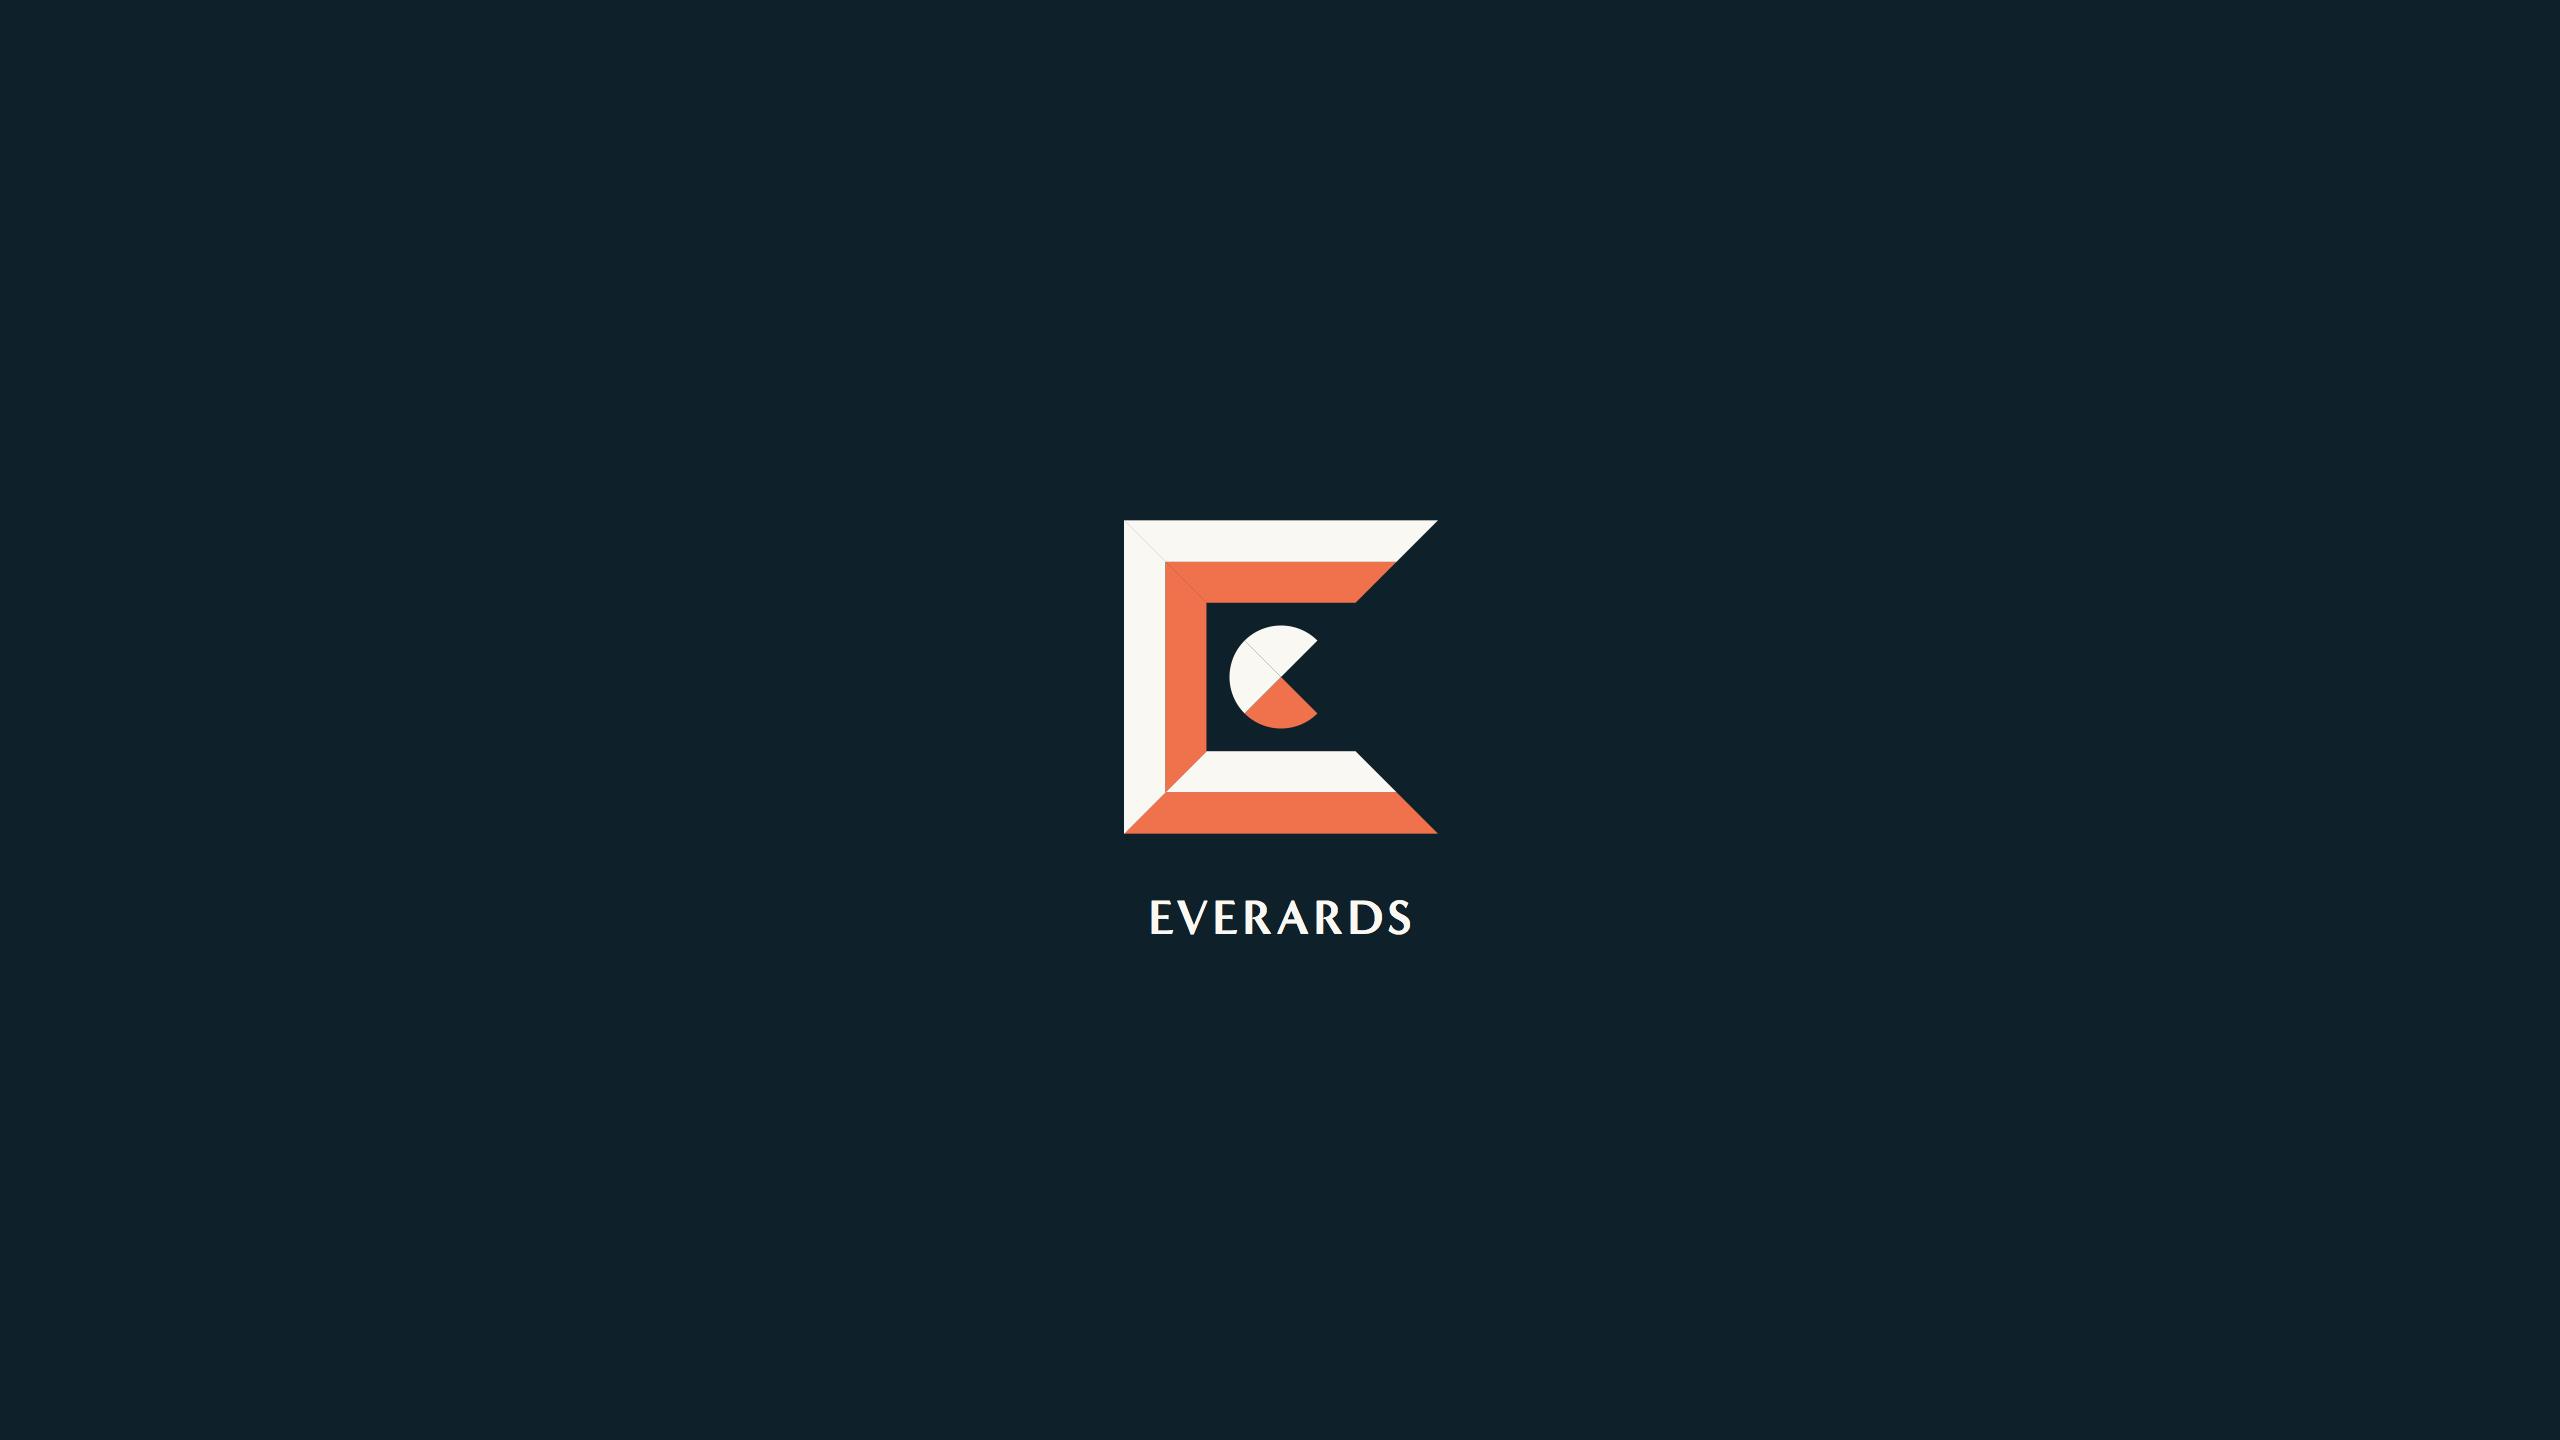 Cover image: Everards